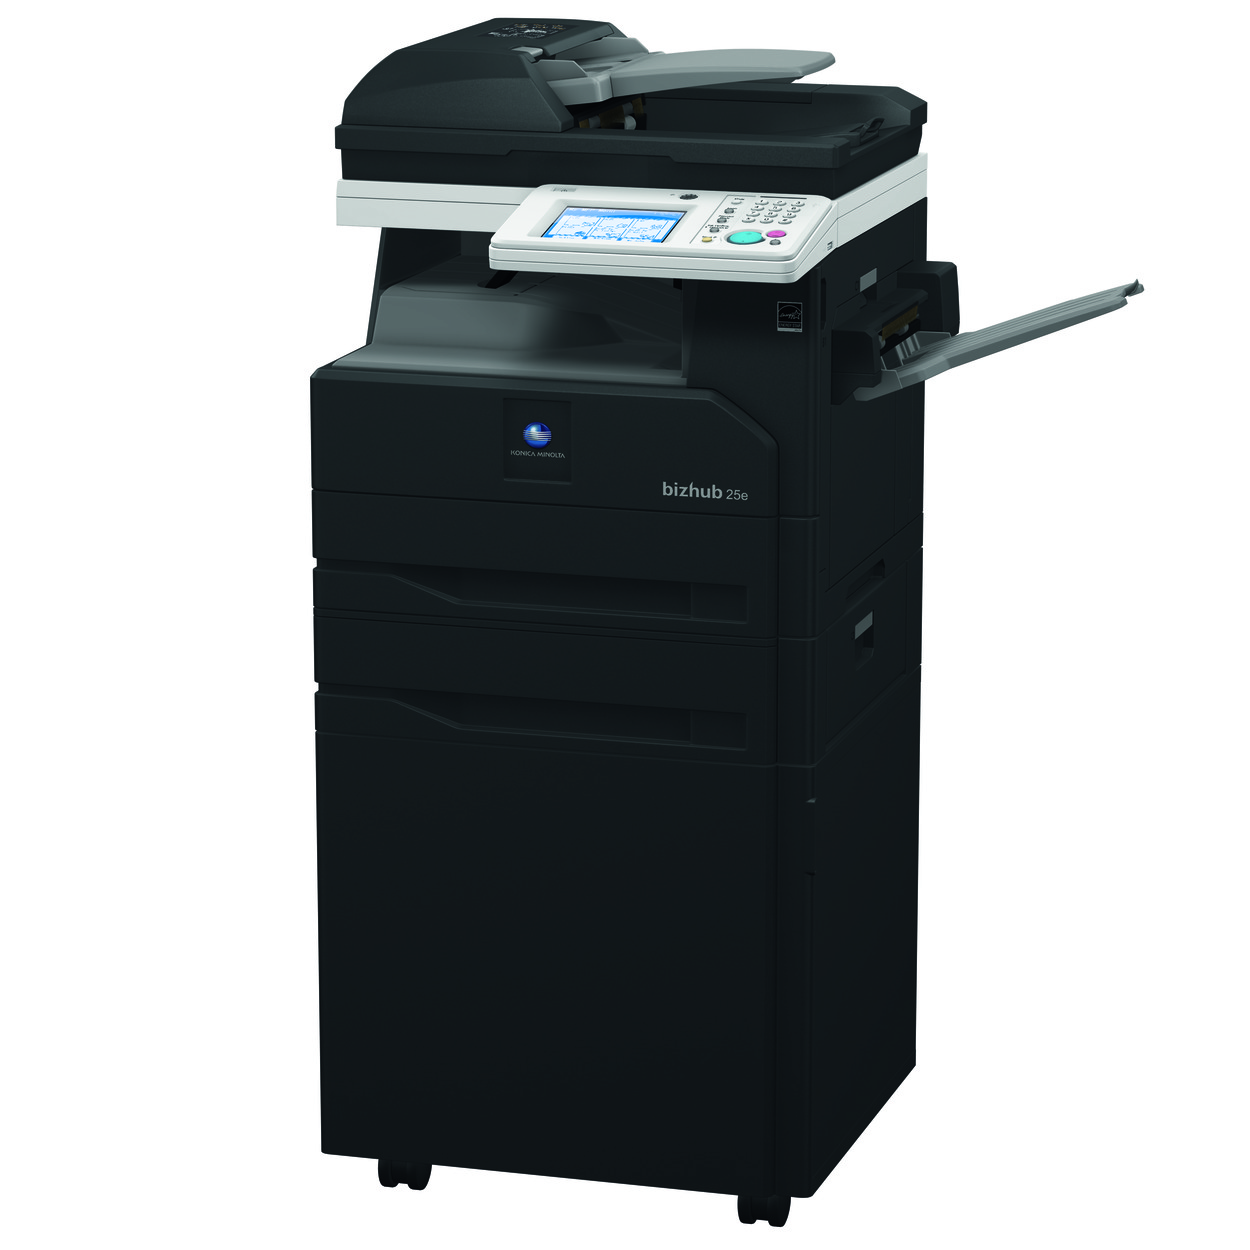 Konica Minolta Bizhub 25e Multifunction Printer Ebm Ltd